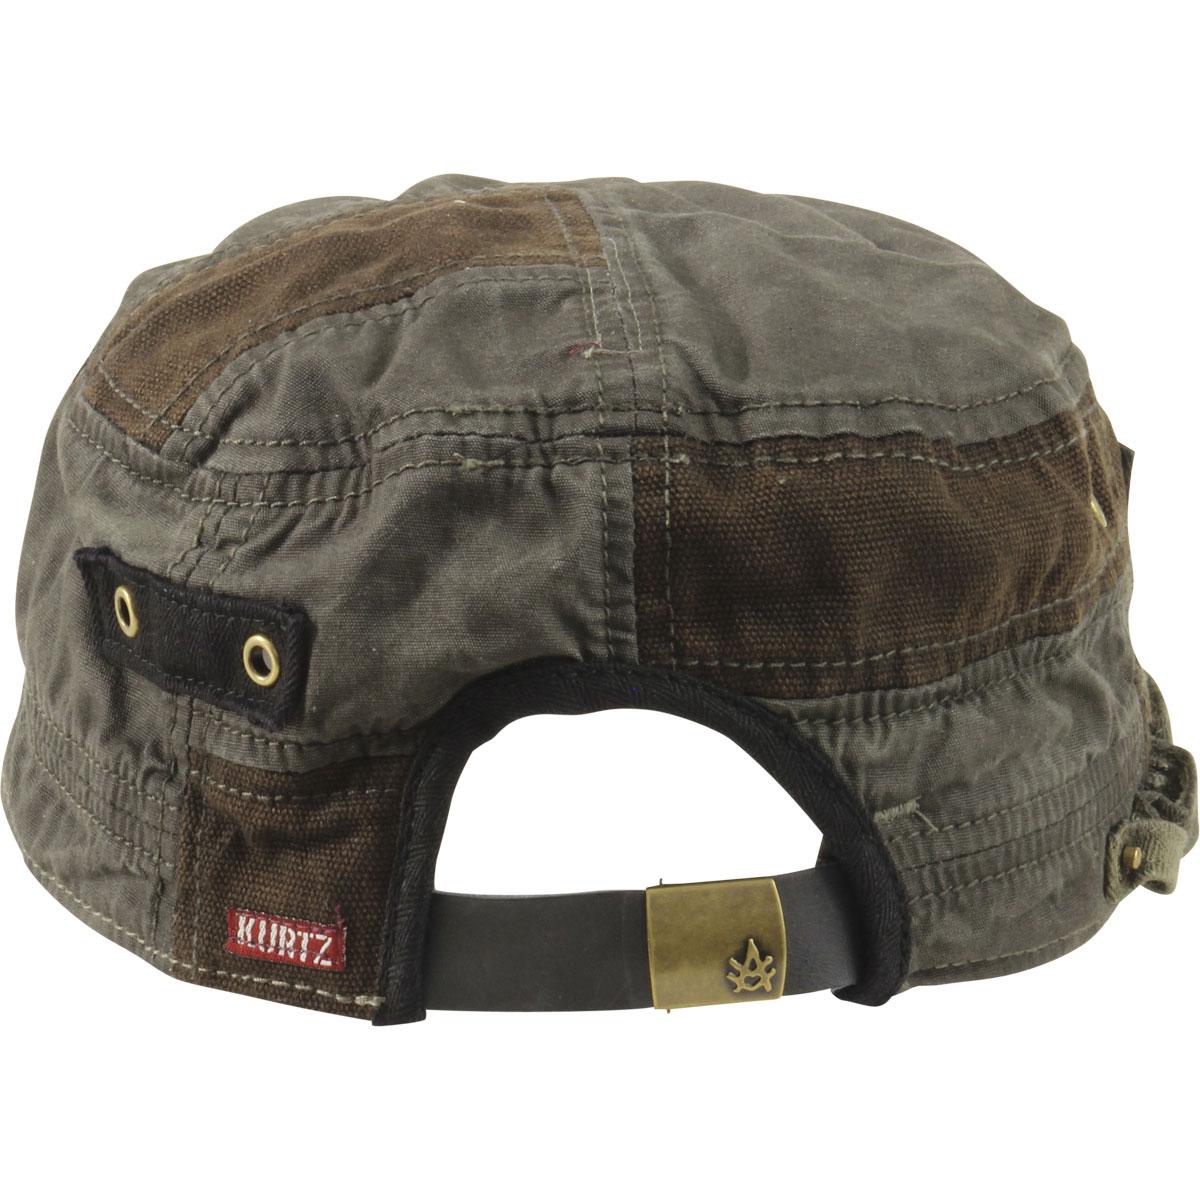 Kurtz Special Forces Legion Military Cap Hat (One Size Fits Most)  042bddc6efa